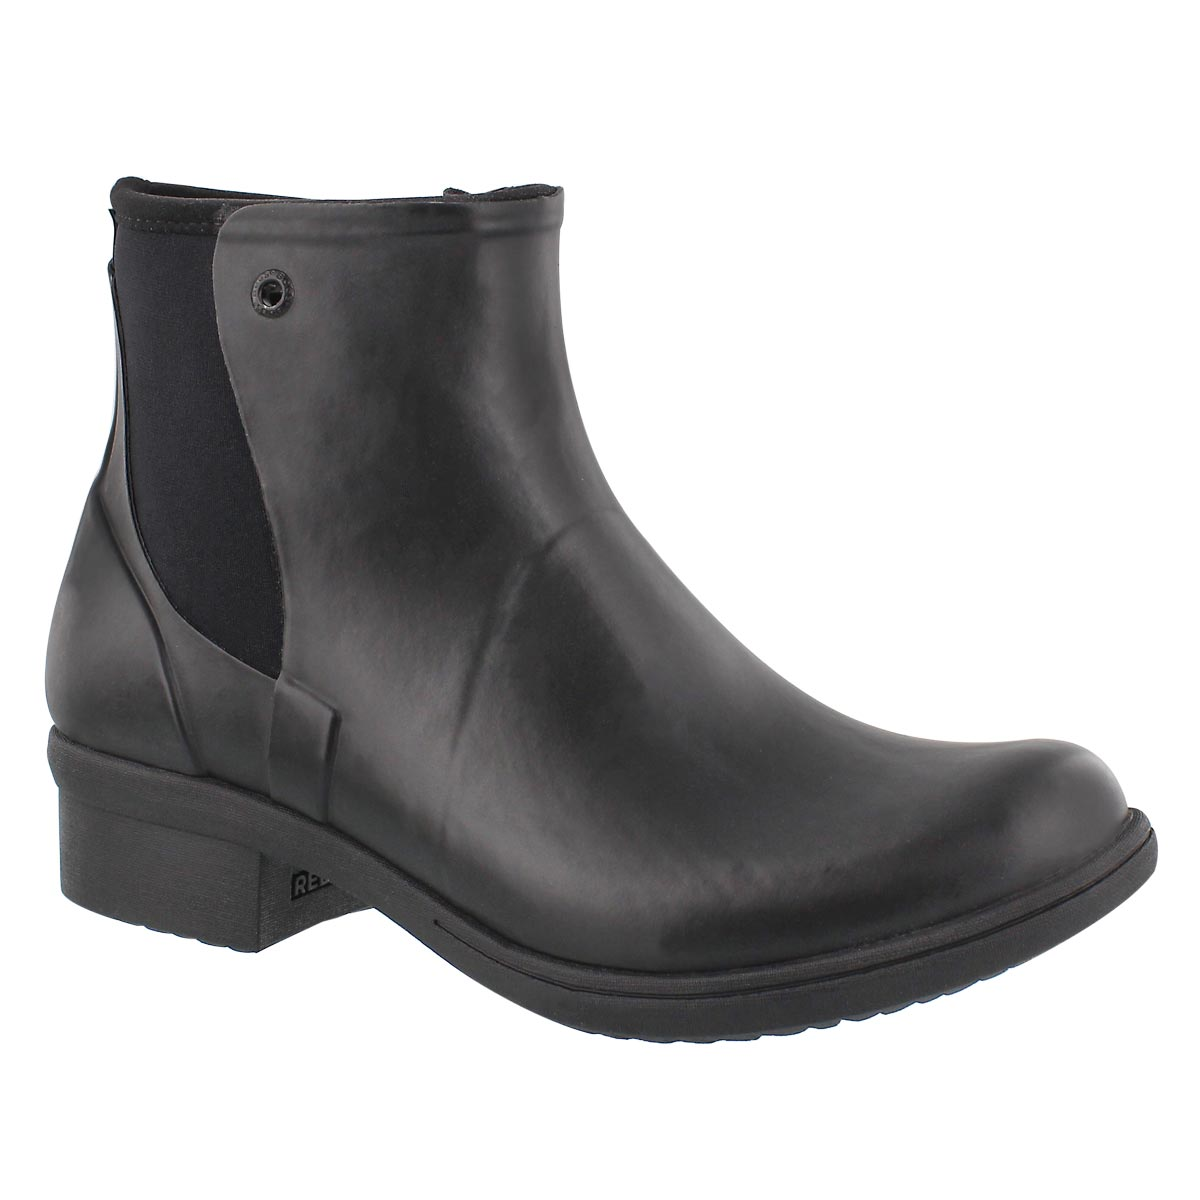 Women's AUBURN black wtpf slip on winter boots